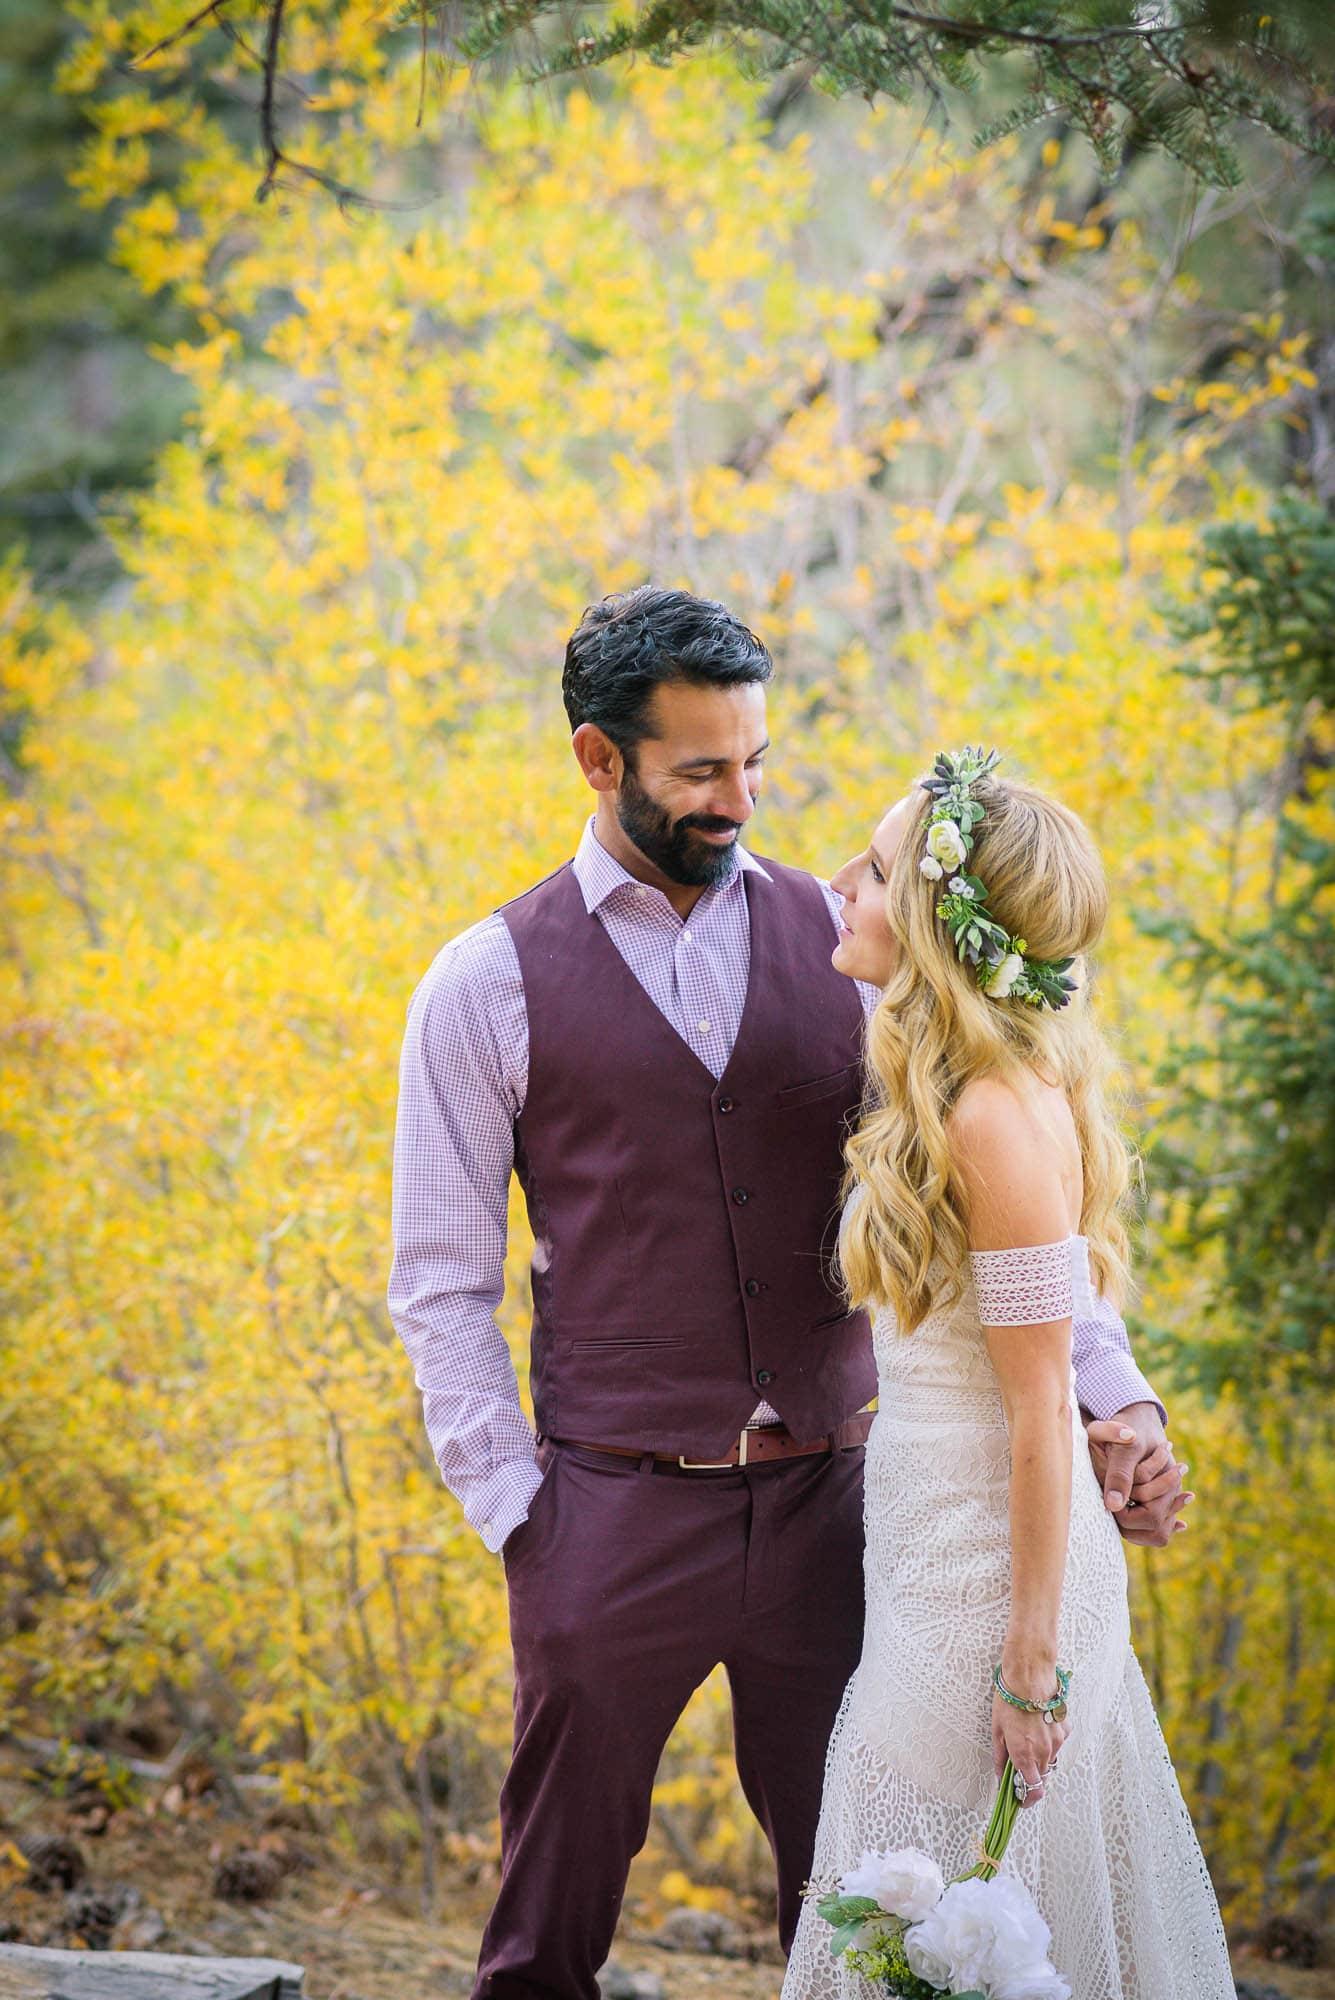 035_Alan_and_Heidi_Wedding_Natalie_Mike